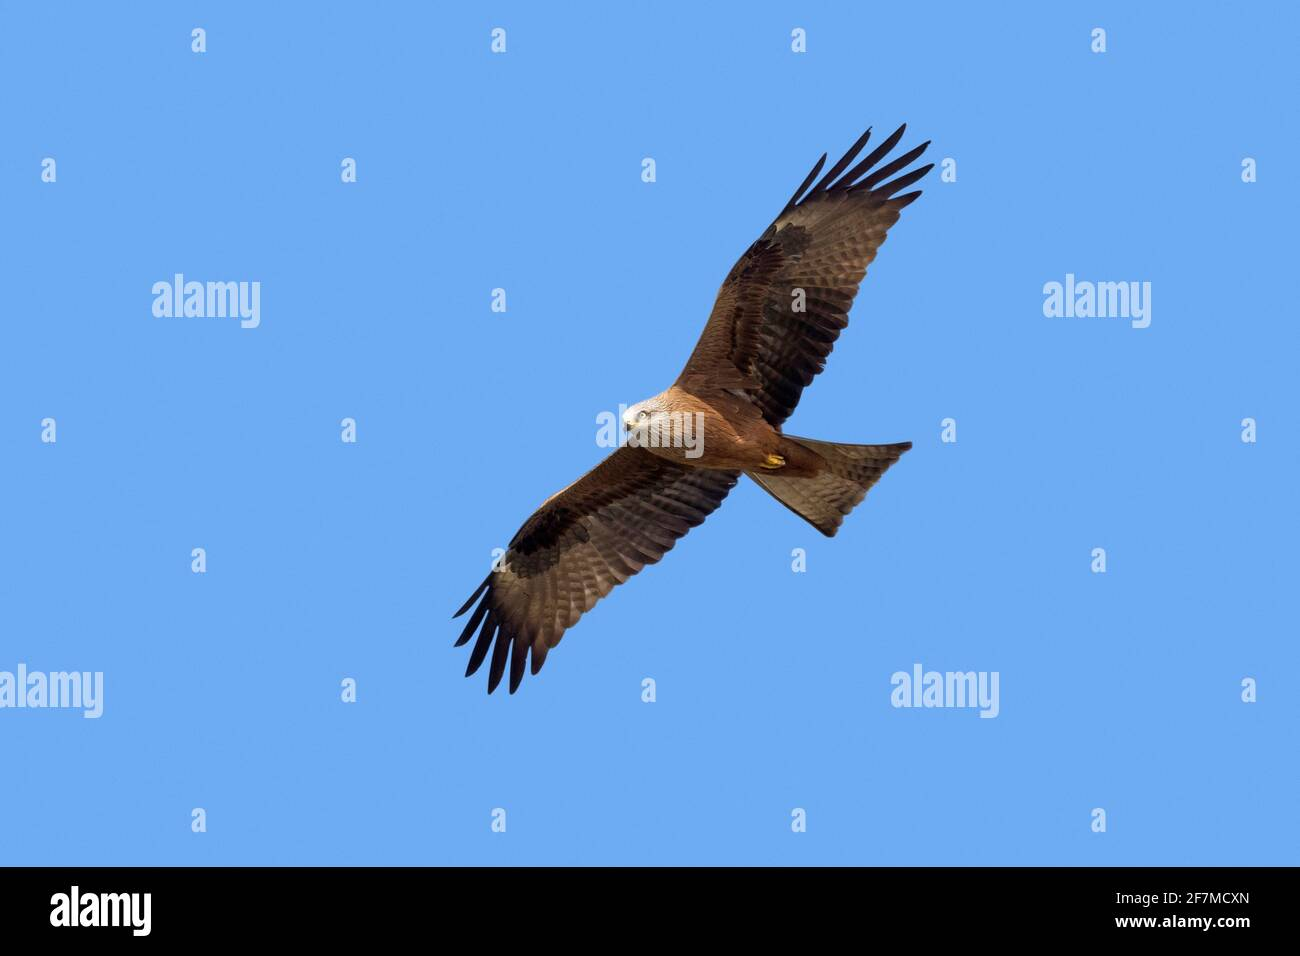 Cerf-volant noir (Milvus migrans) en vol contre le ciel bleu Banque D'Images